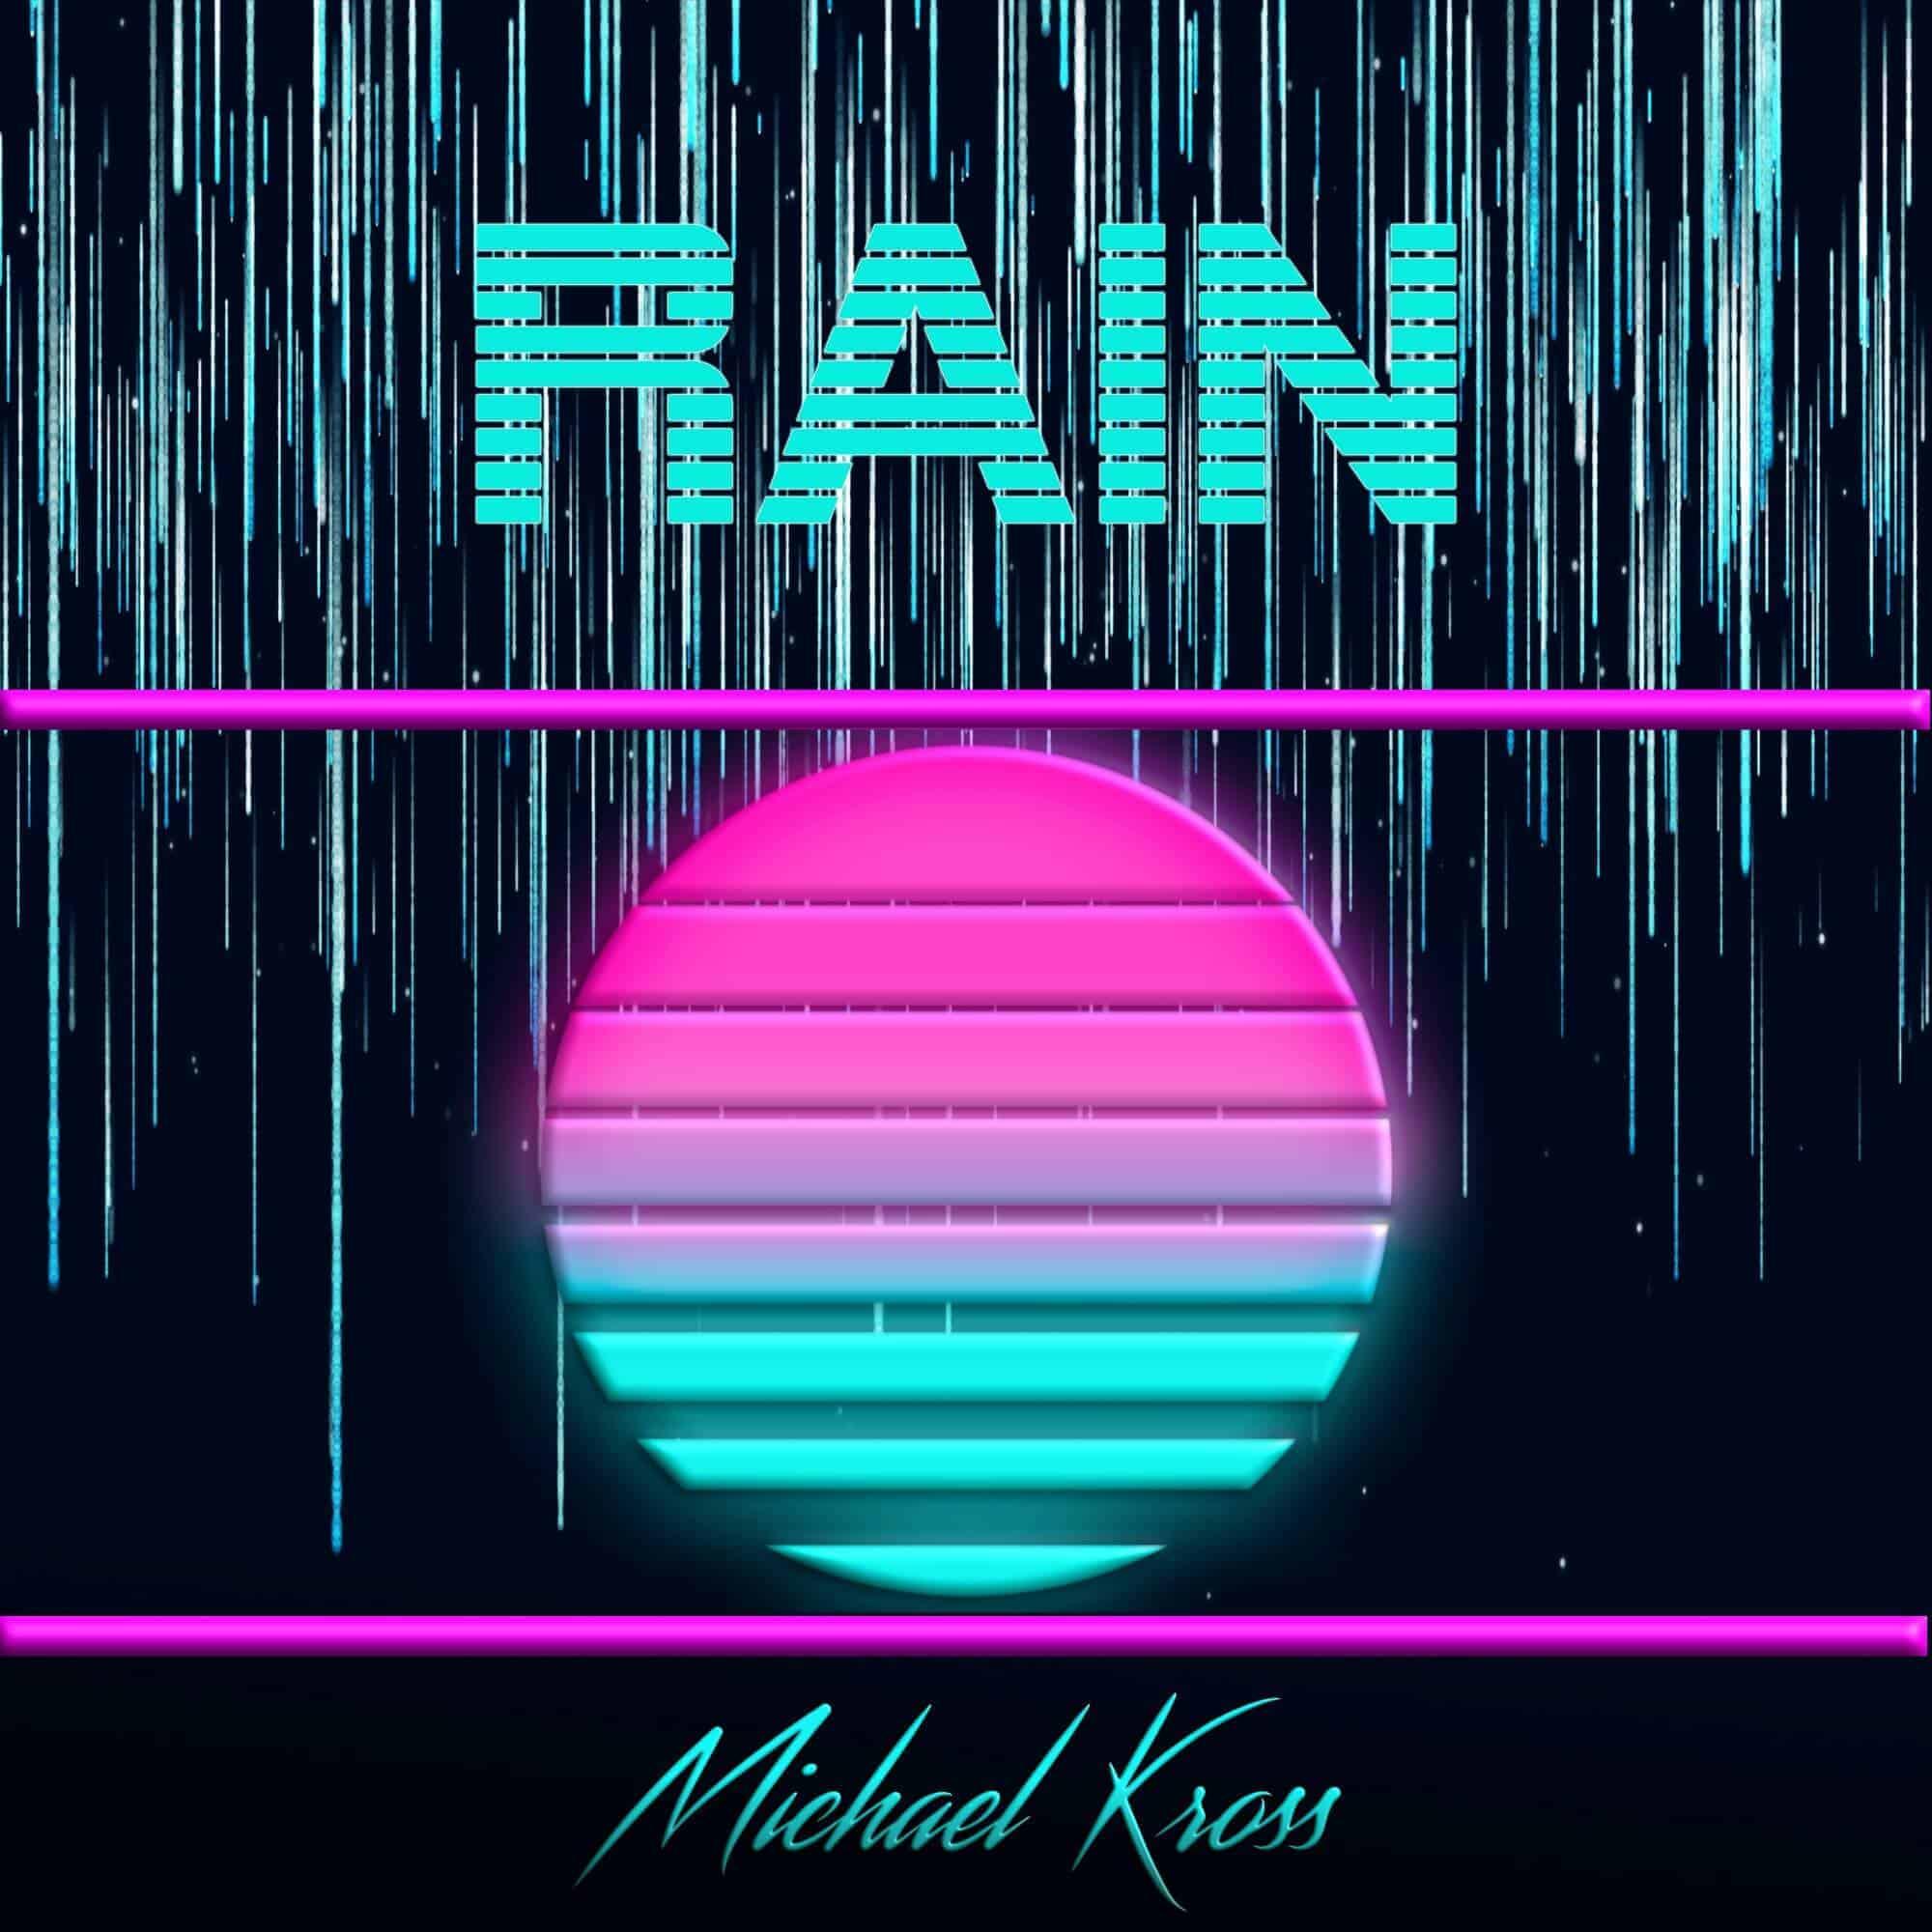 Michael_Kross_Rain